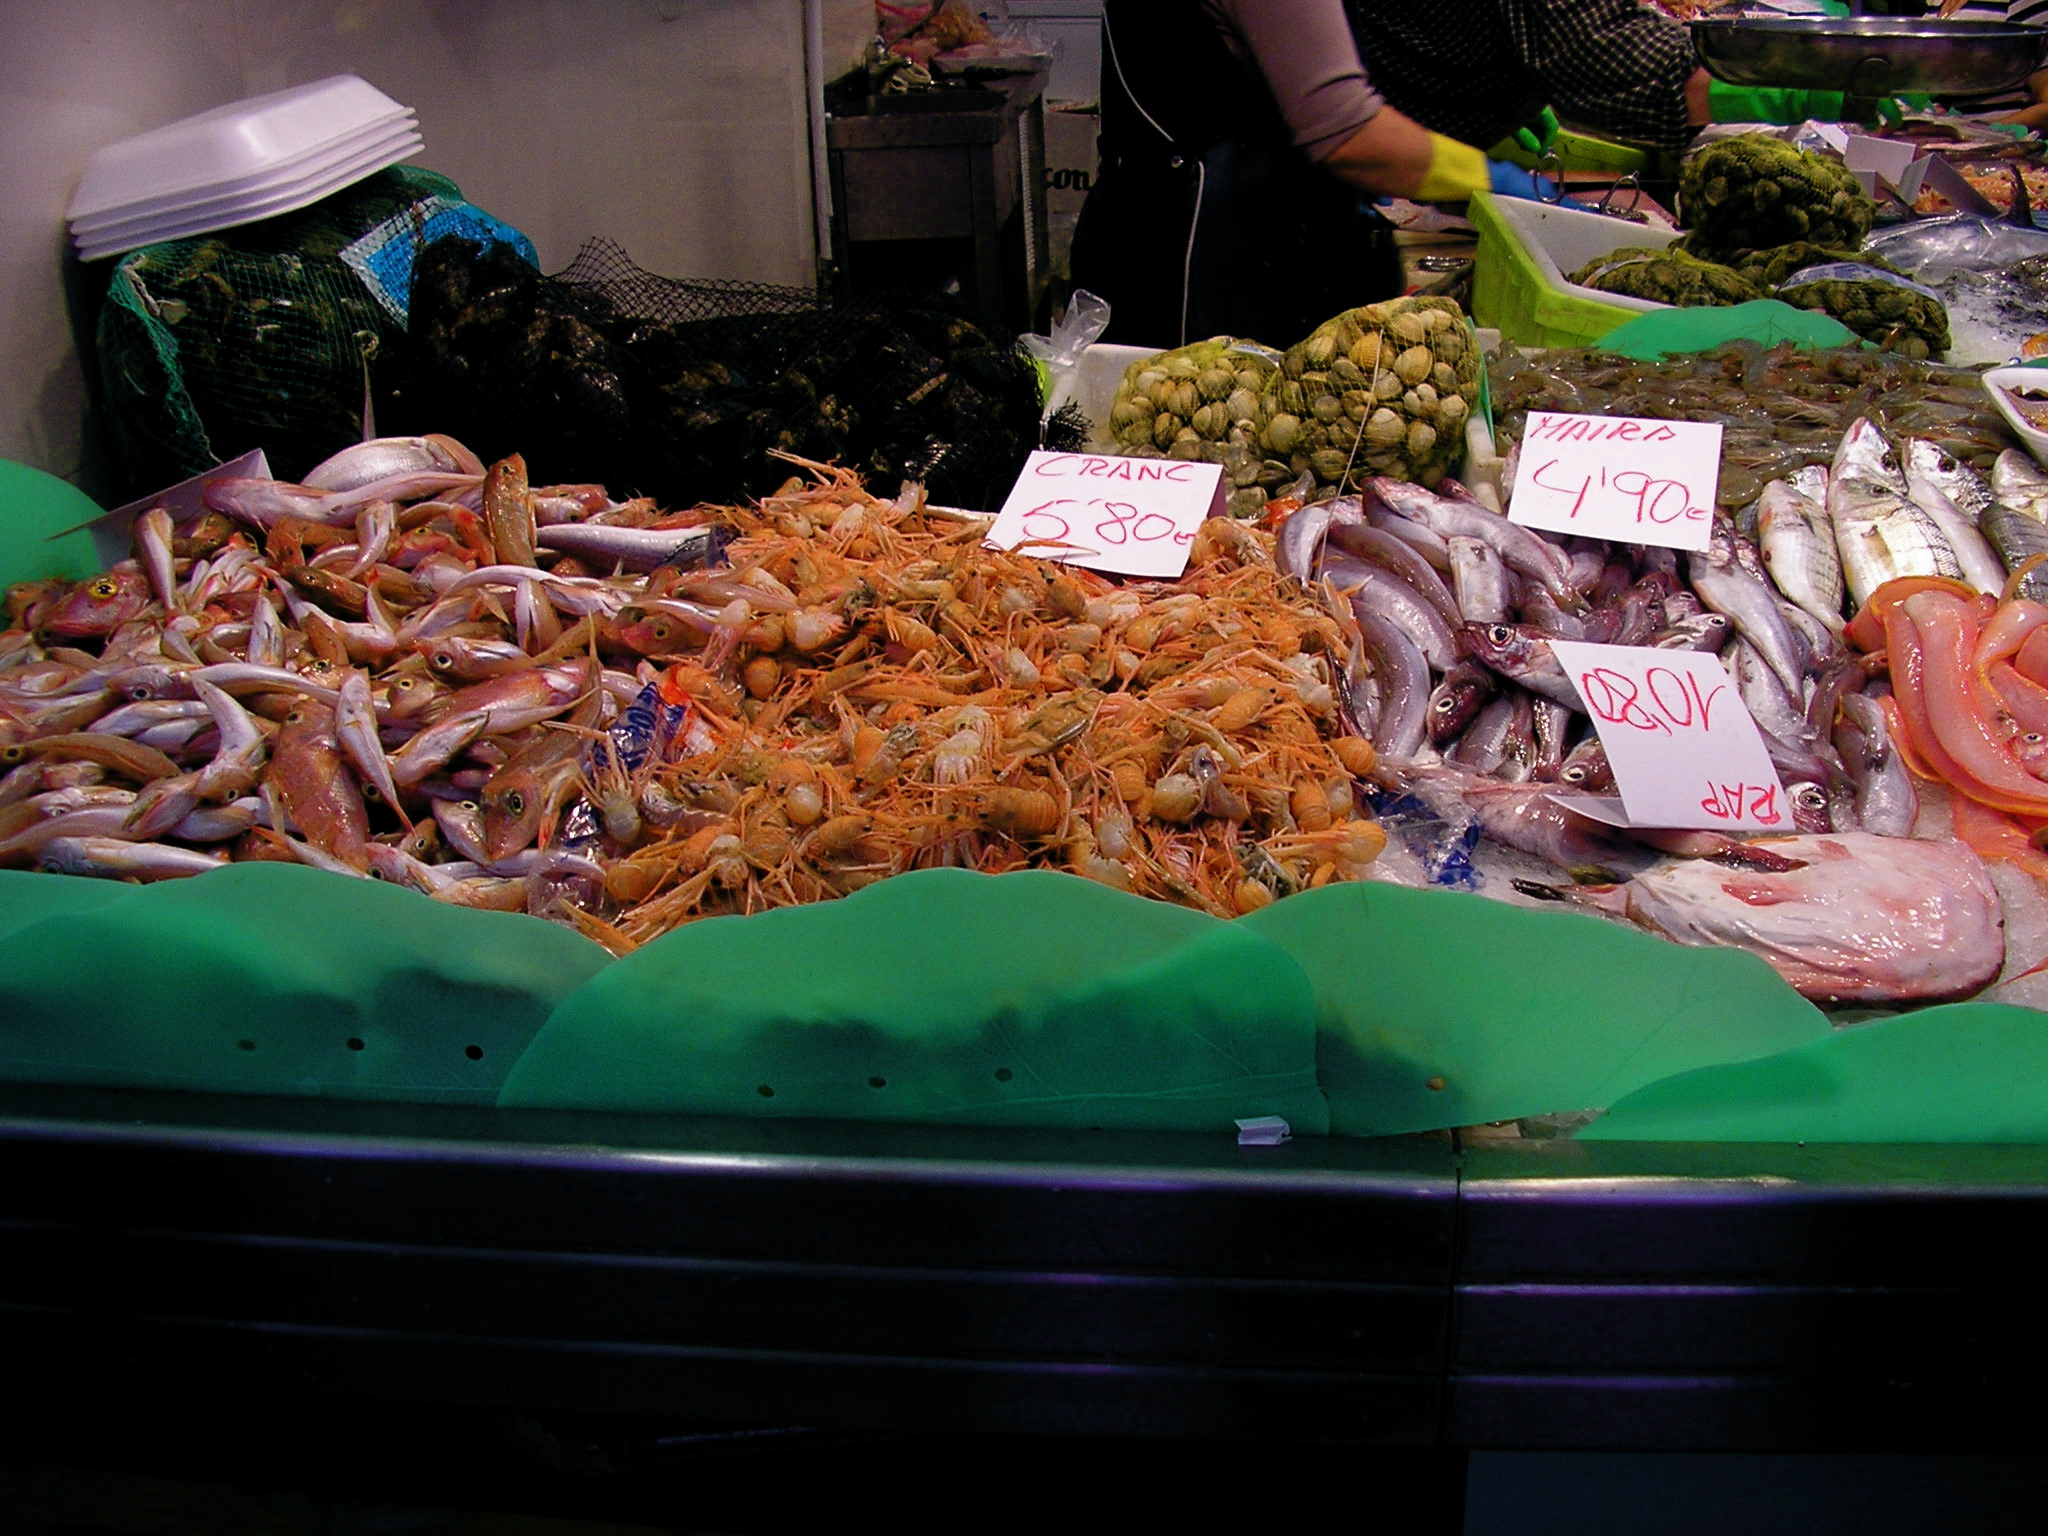 Fresh seafood at a market. Photo © Jillian Regan 2010